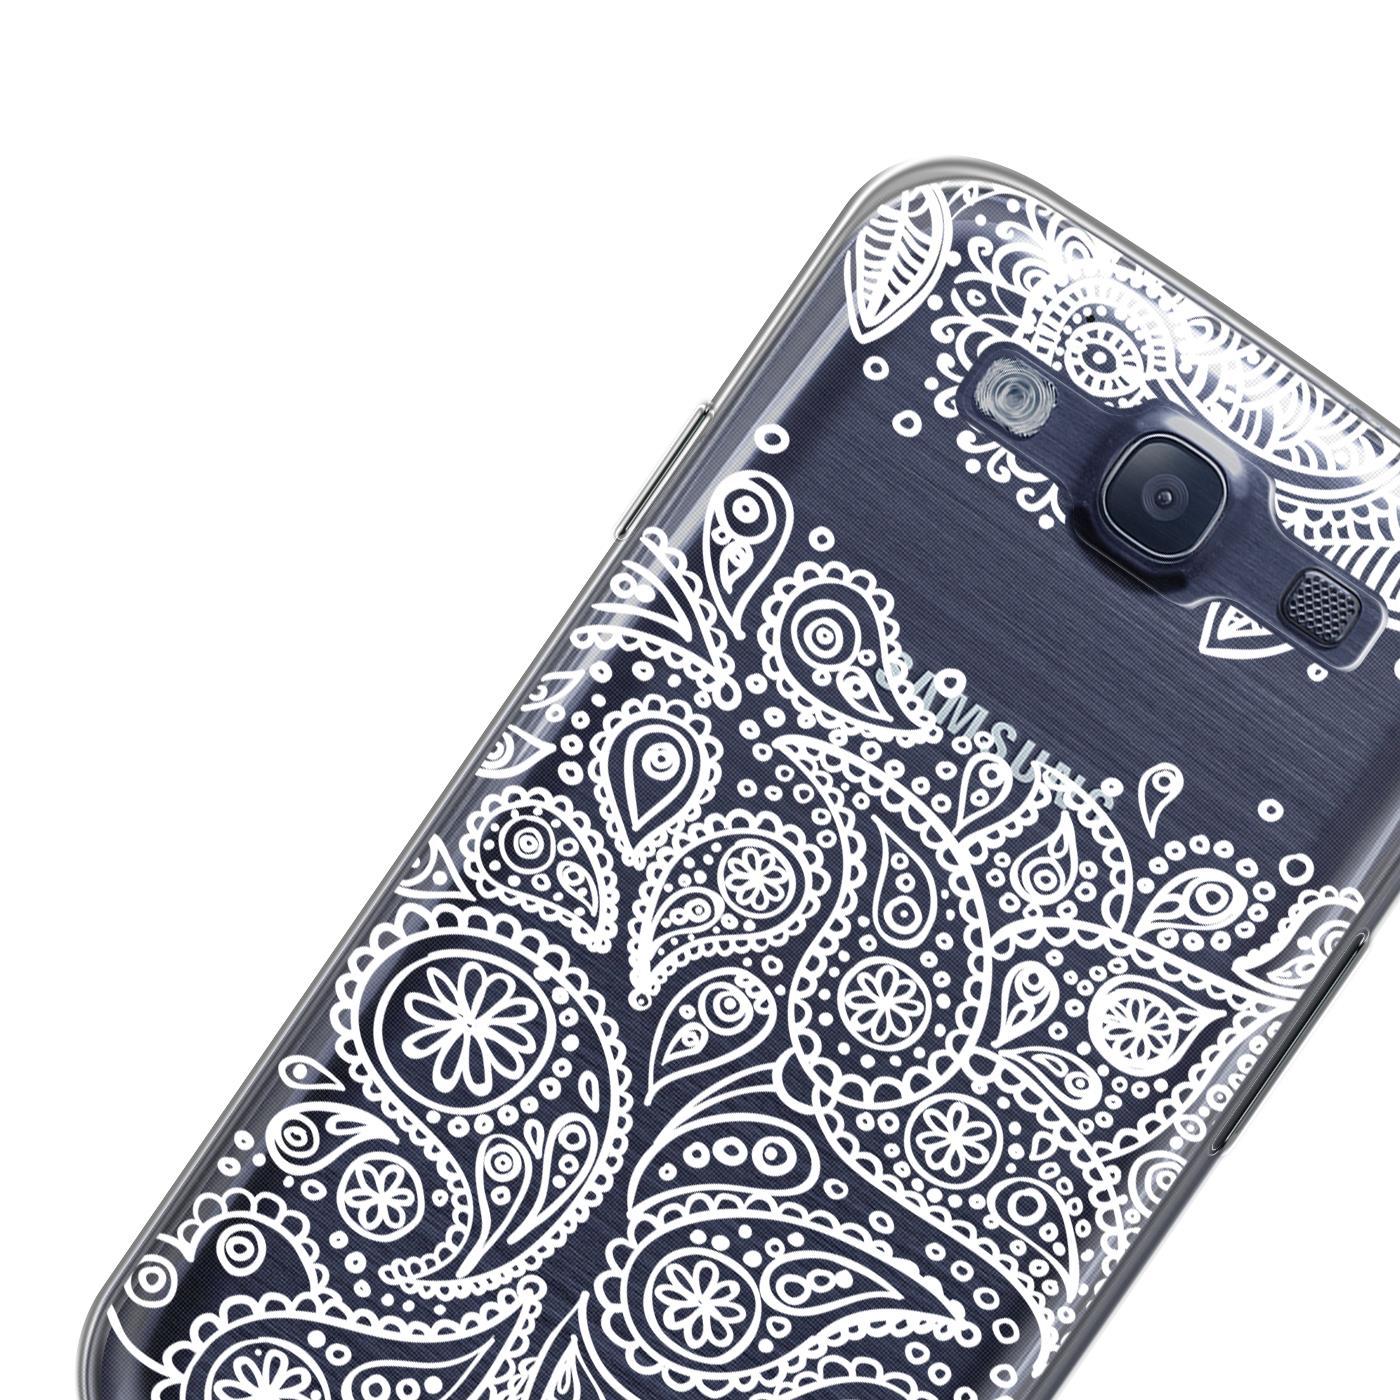 Samsung-Galaxy-S3-Neo-Handy-Schutz-Huelle-Case-TPU-Silikon-Cover-Tasche-Mandala Indexbild 24